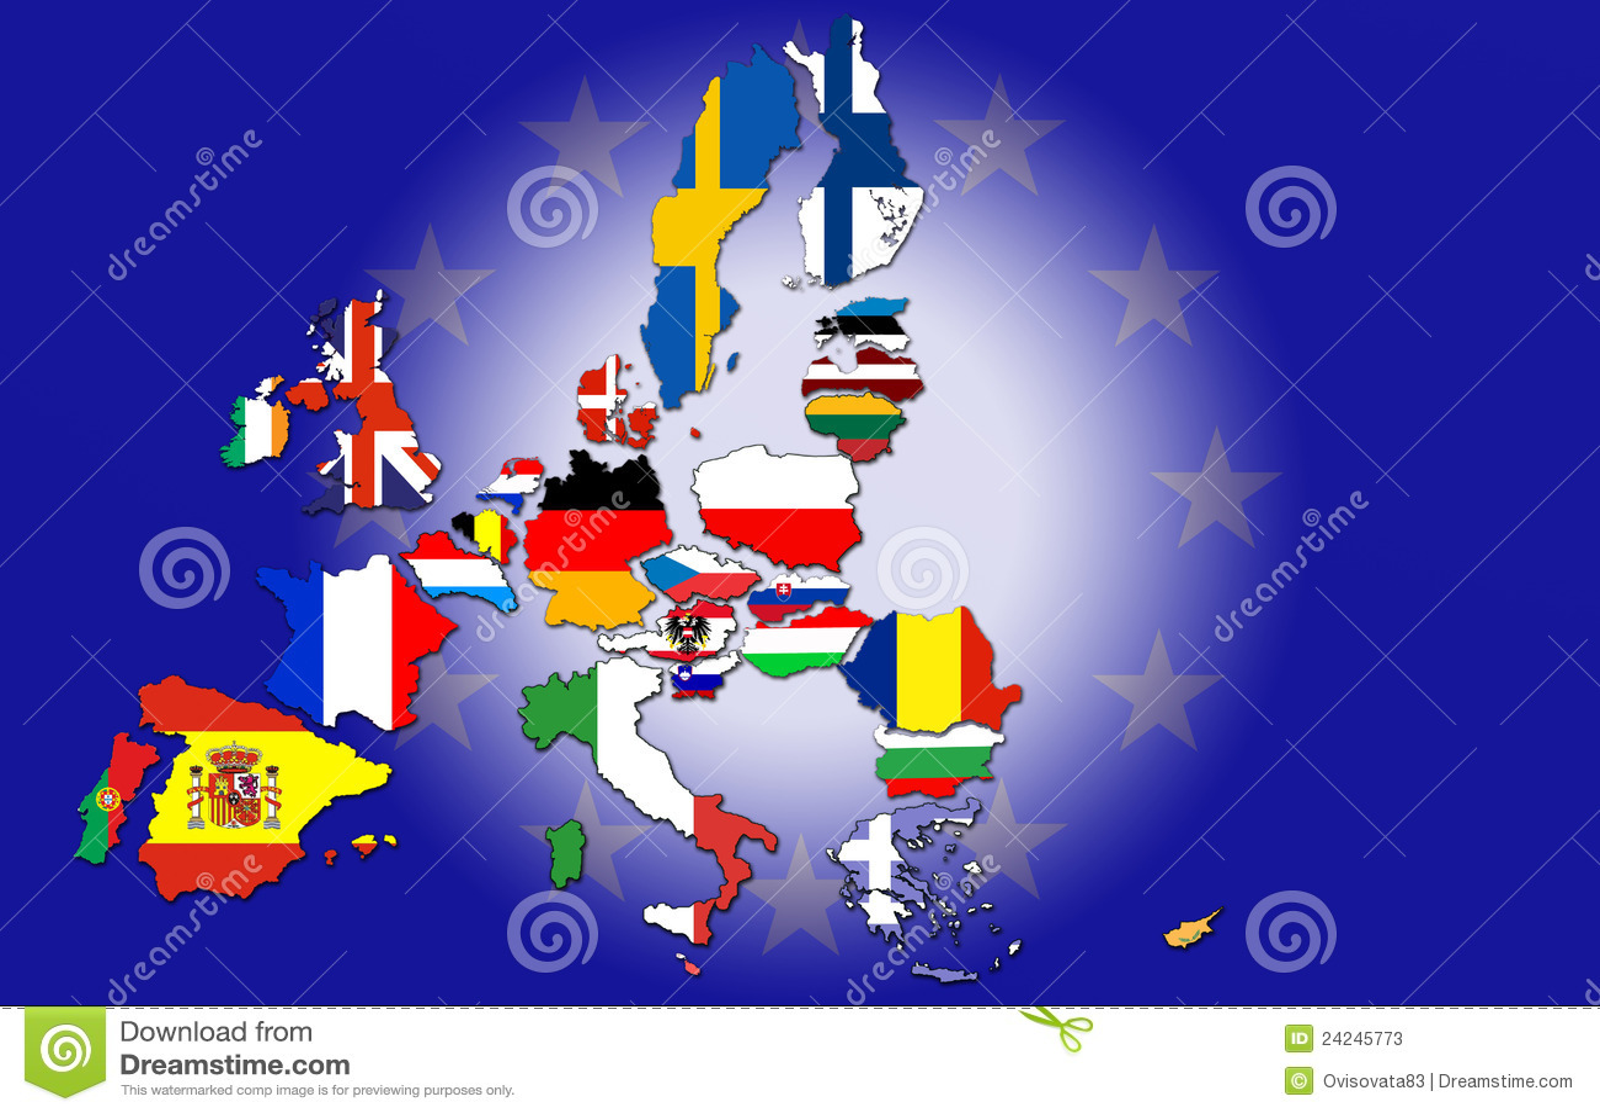 european union countries stock photos image 24245773. Black Bedroom Furniture Sets. Home Design Ideas